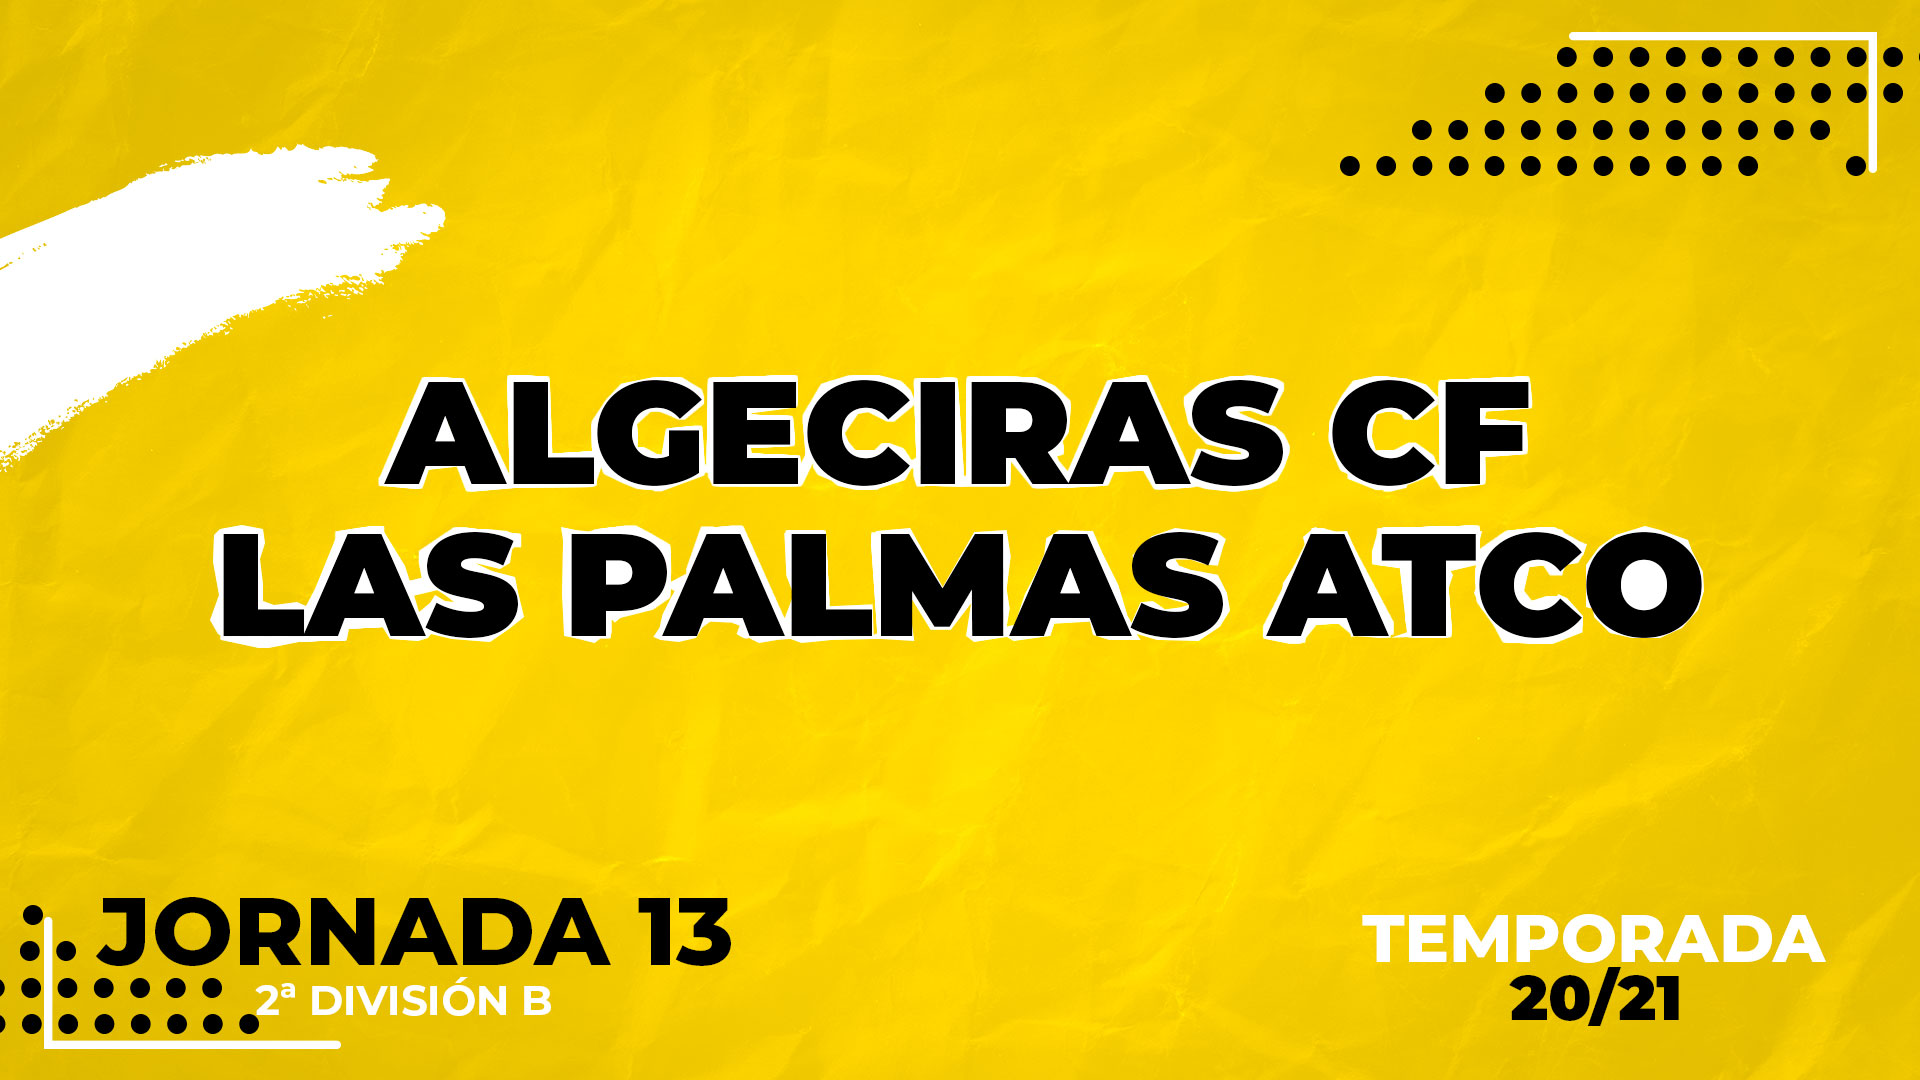 Algeciras vs Las Palmas Atlético